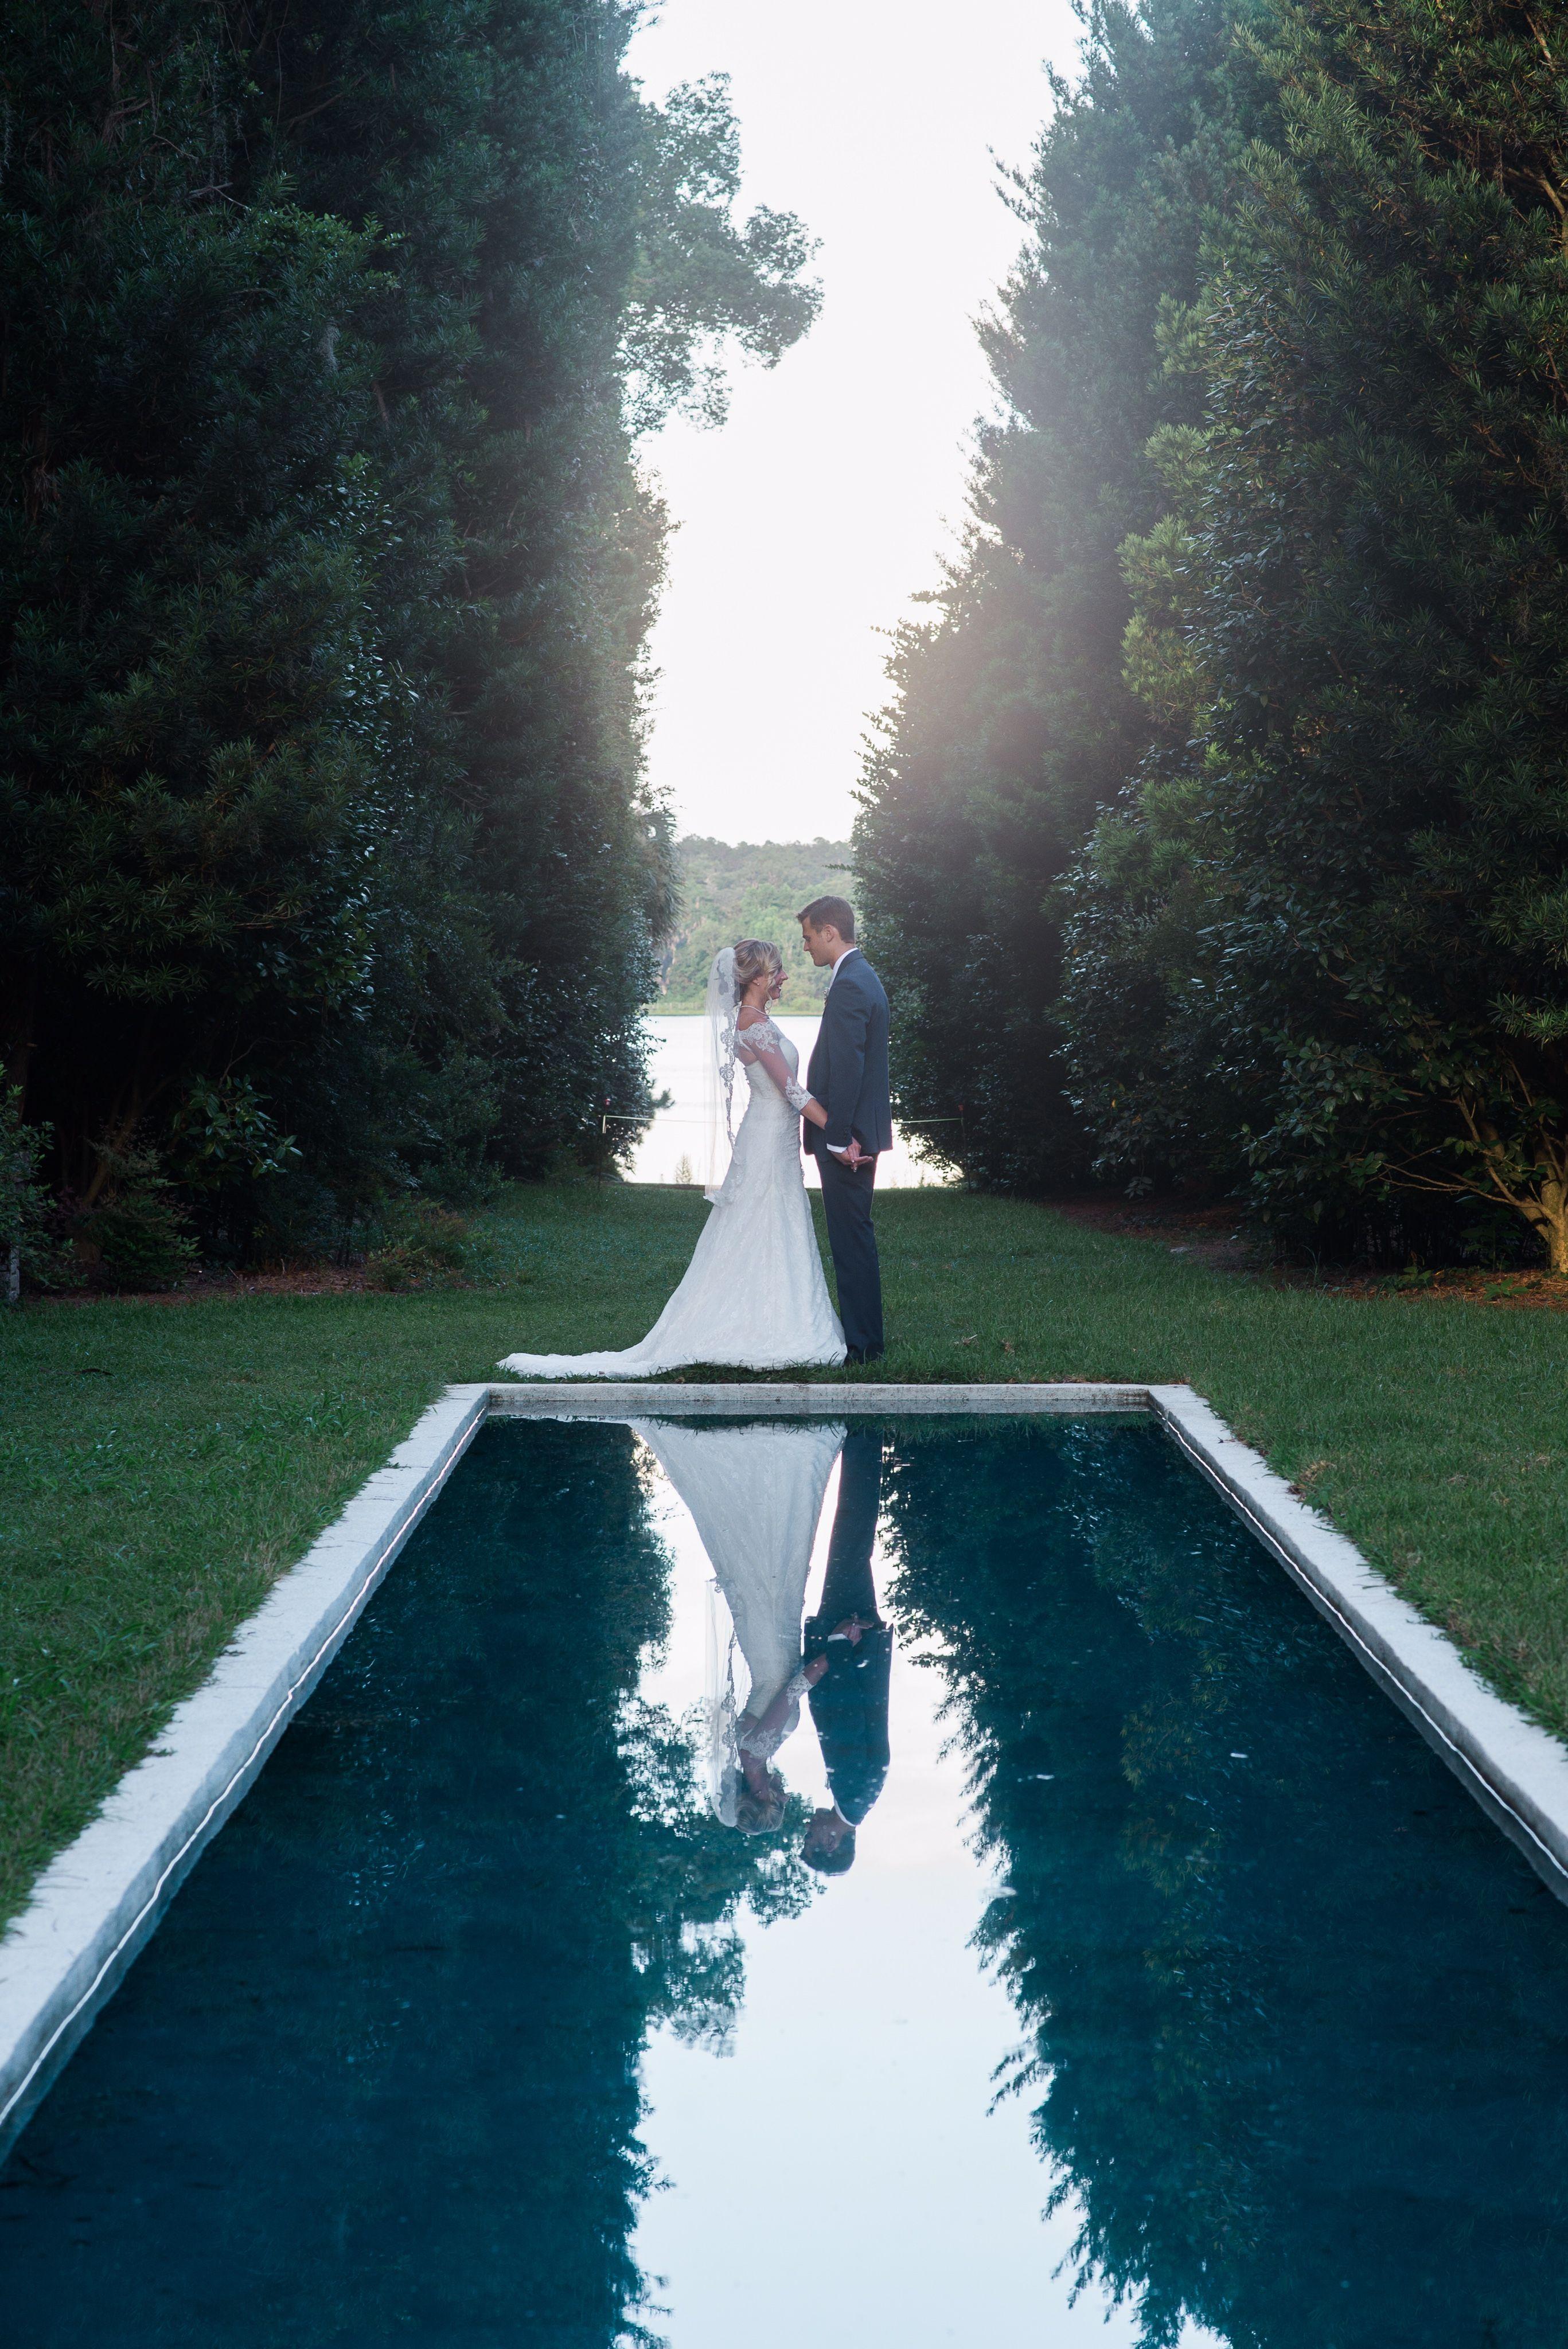 Maclay Gardens Tallahassee, FL wedding Columbia, SC